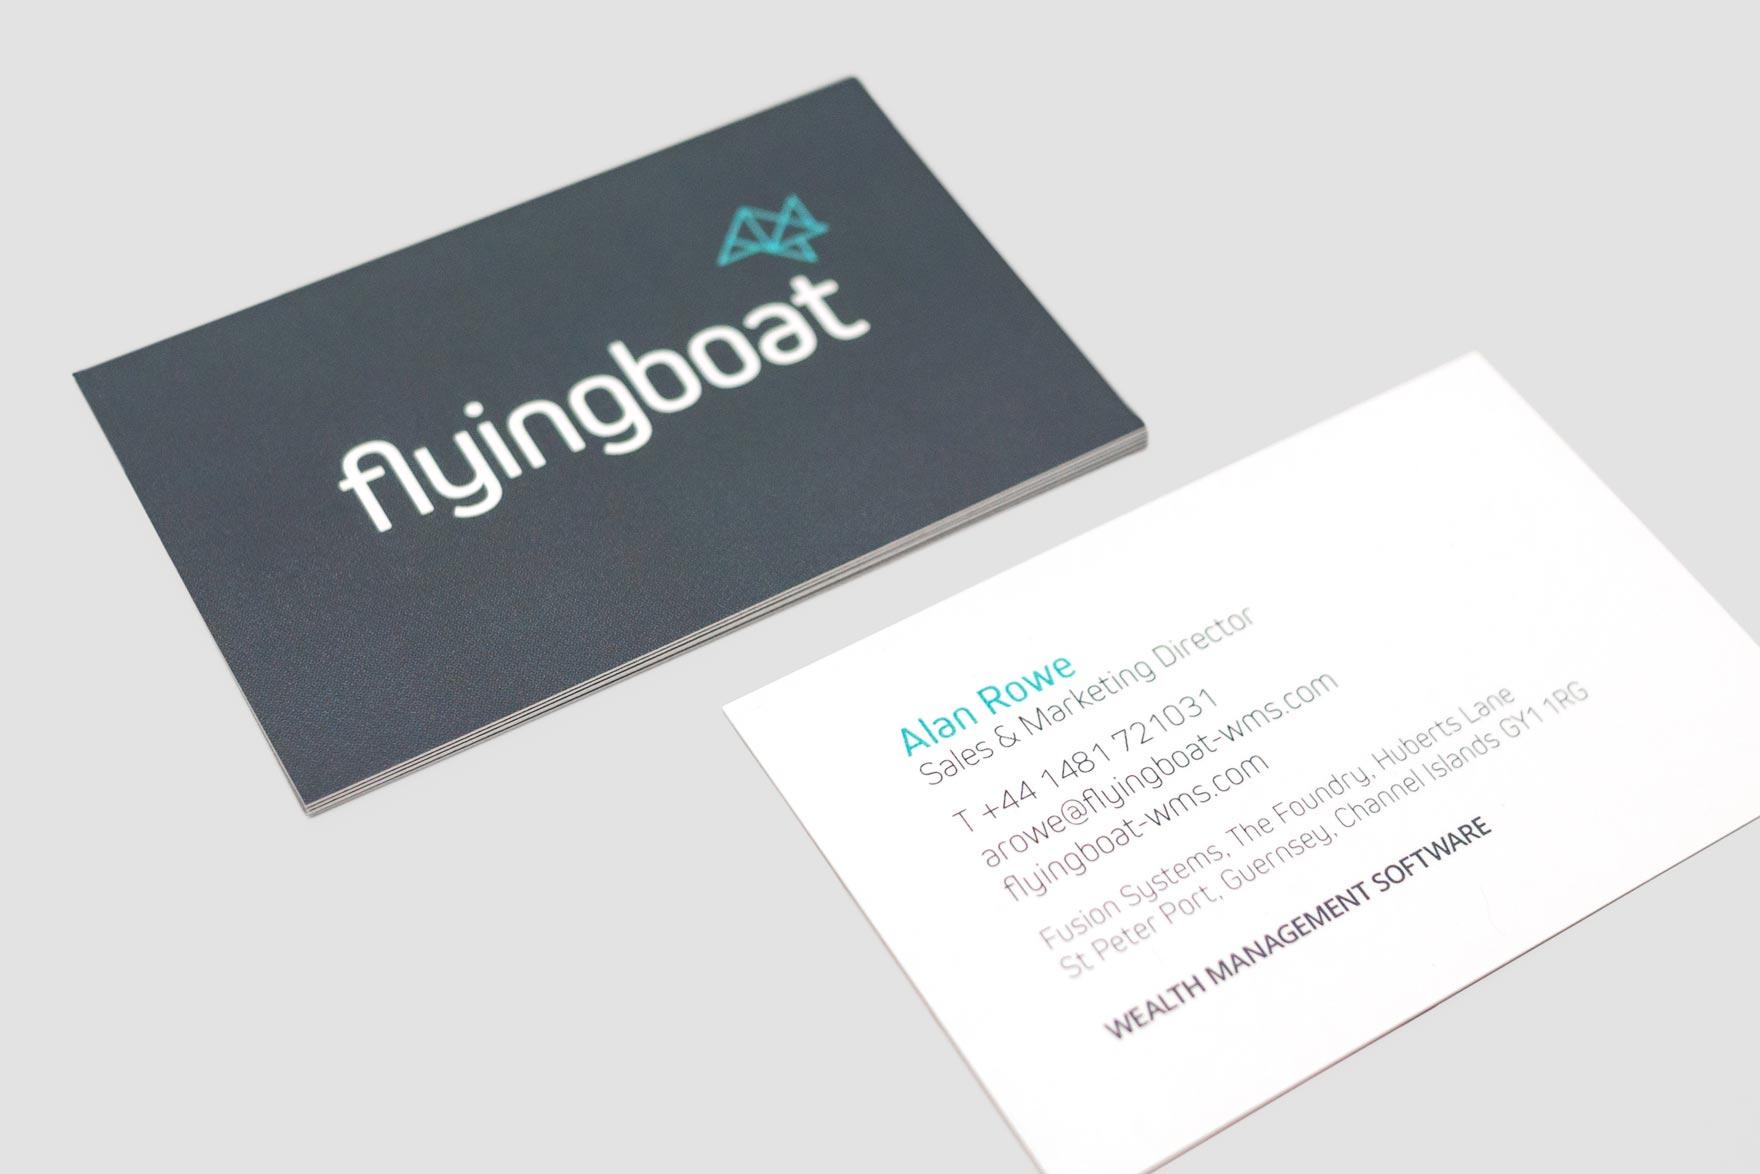 Our work flyingboat wealth management software betley print magicingreecefo Images